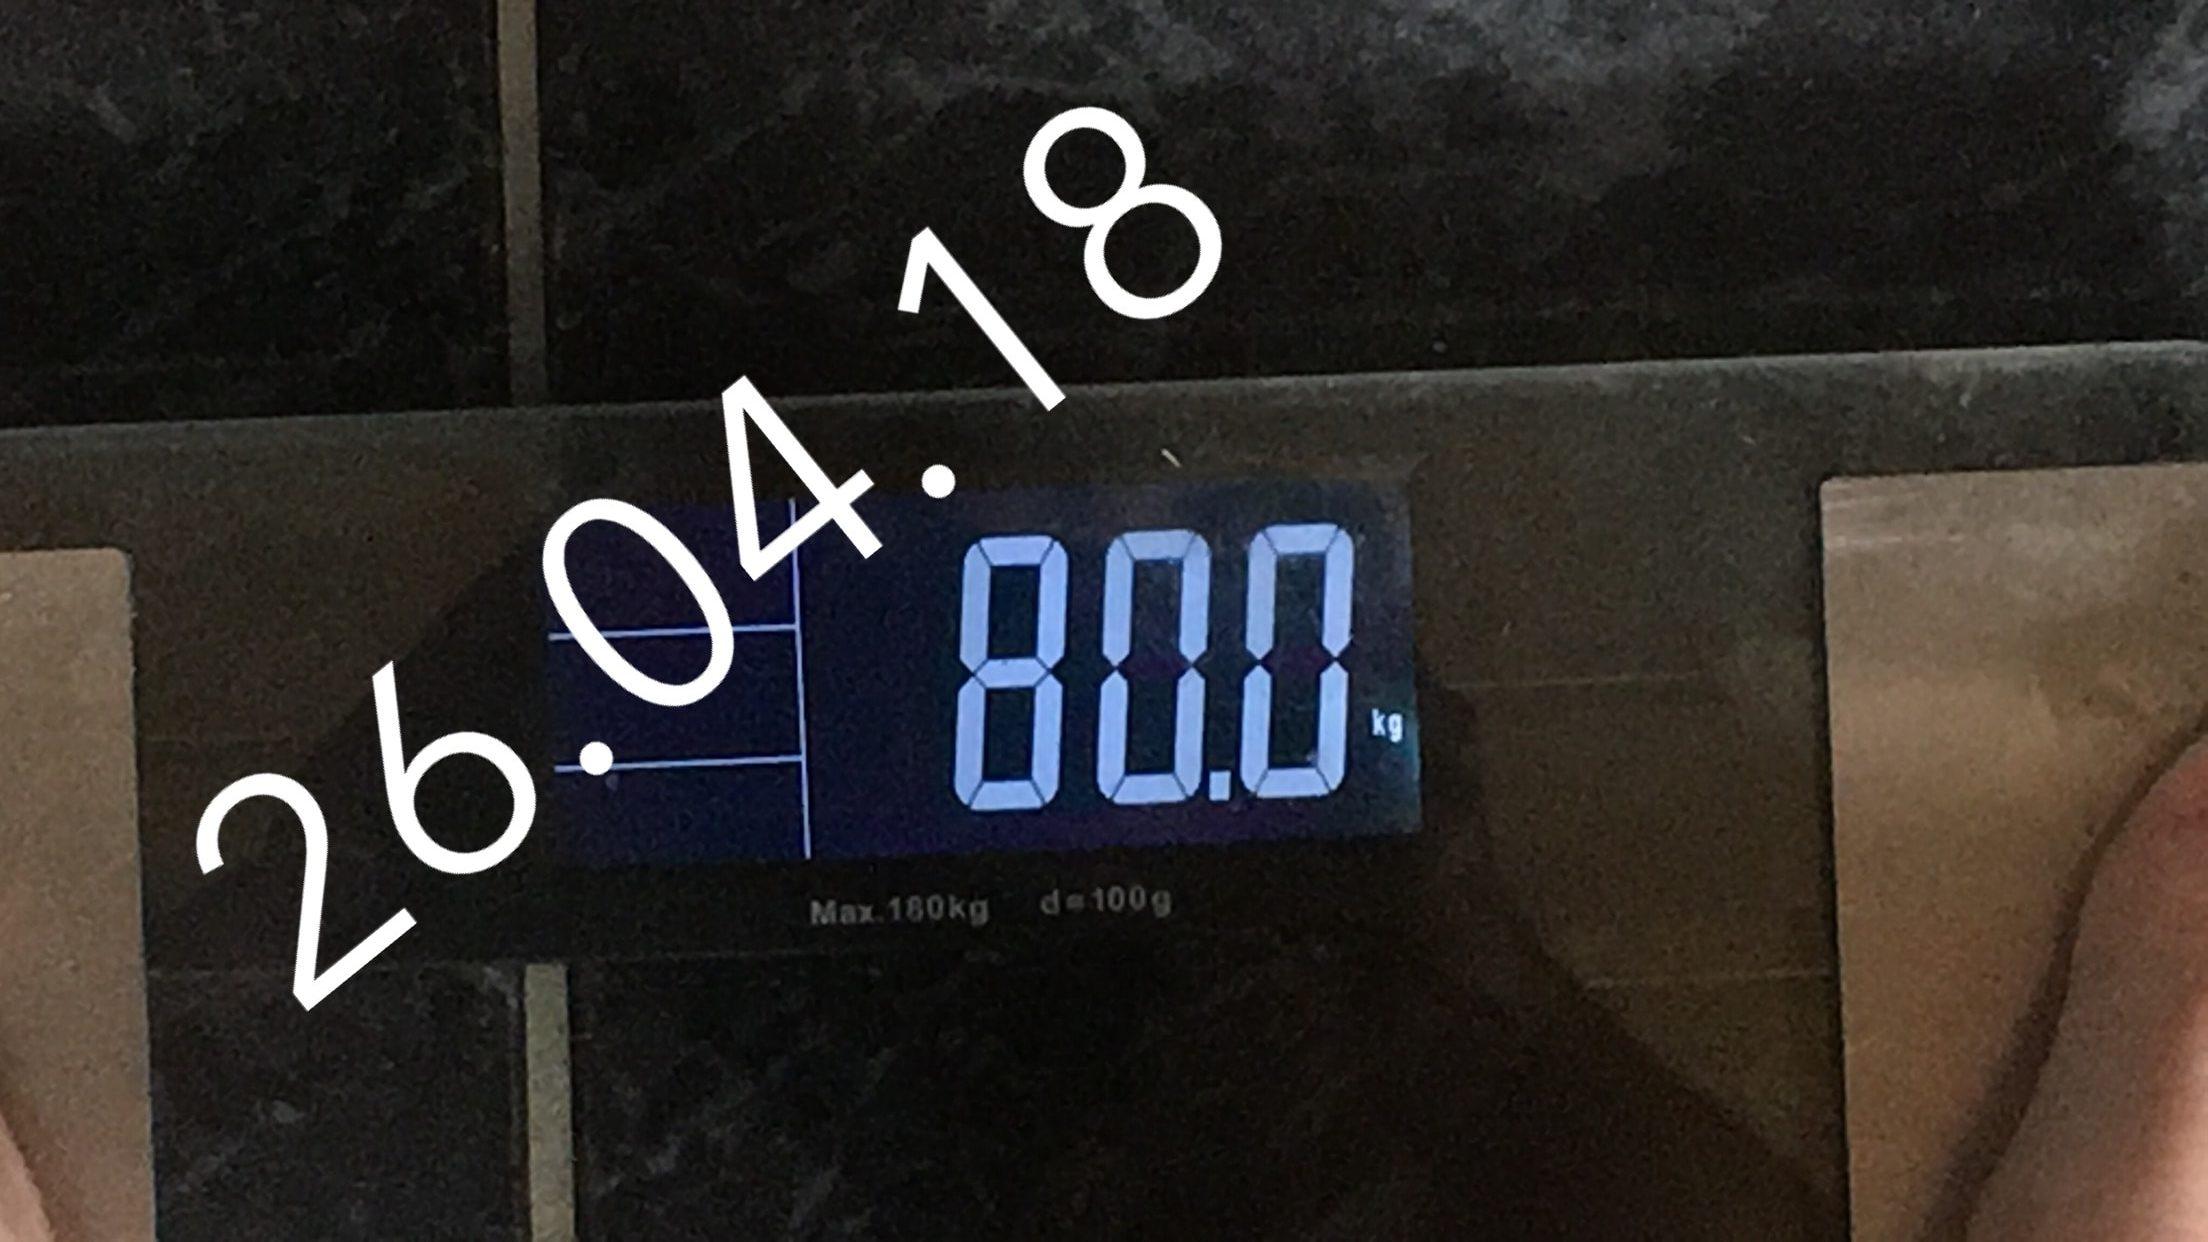 2 Kg zunehmen - Philip Baum zunehmncoach - 26.04 (1)